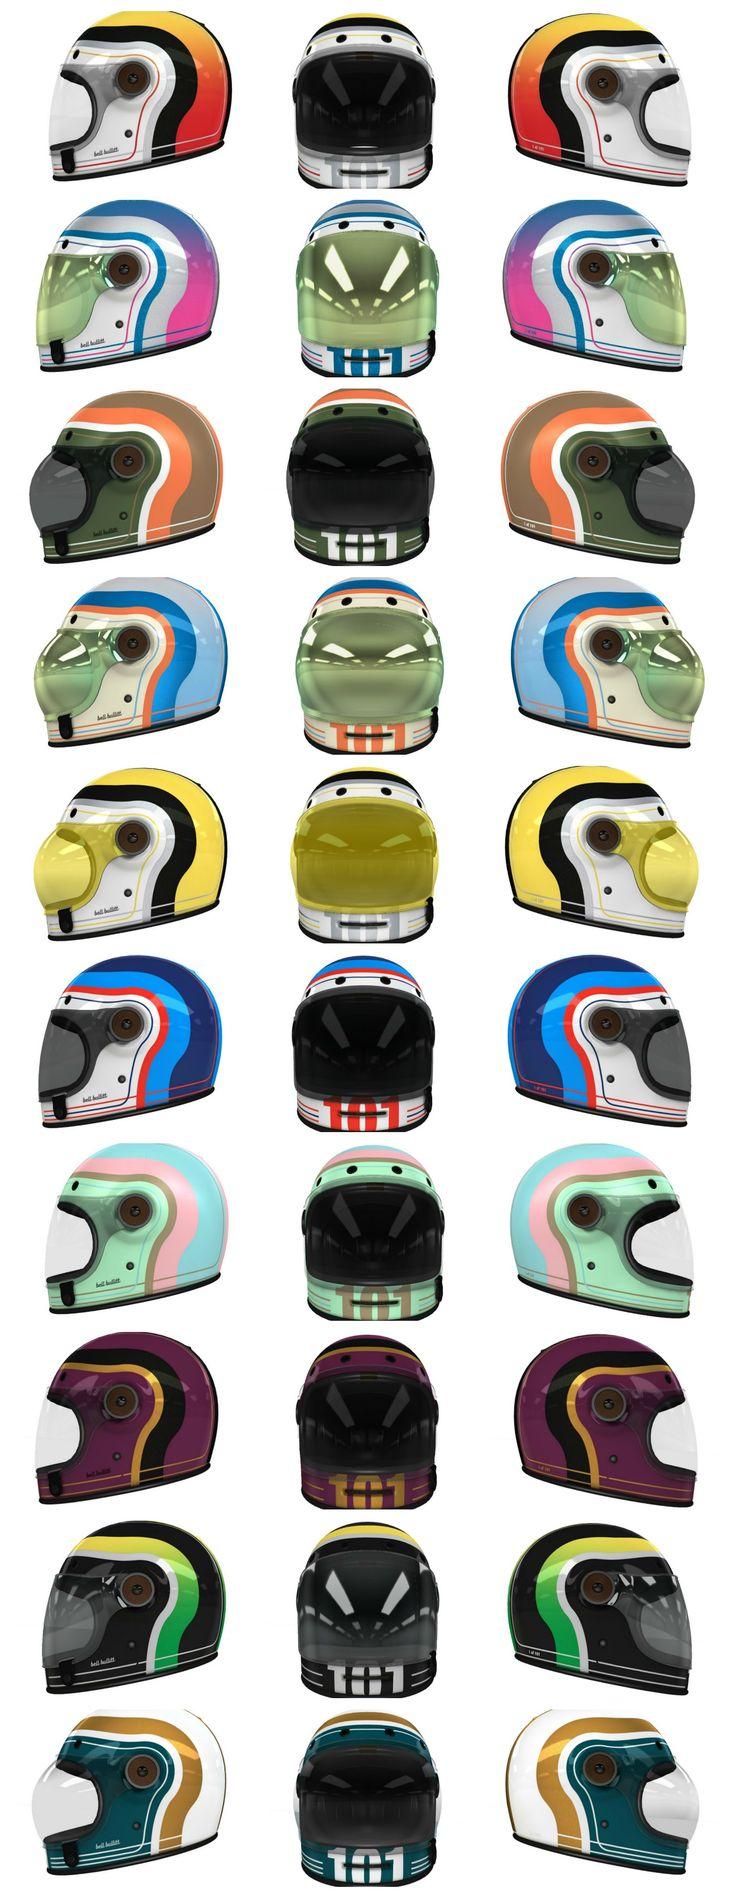 Custom Bell Bullitt Designs by Helmade